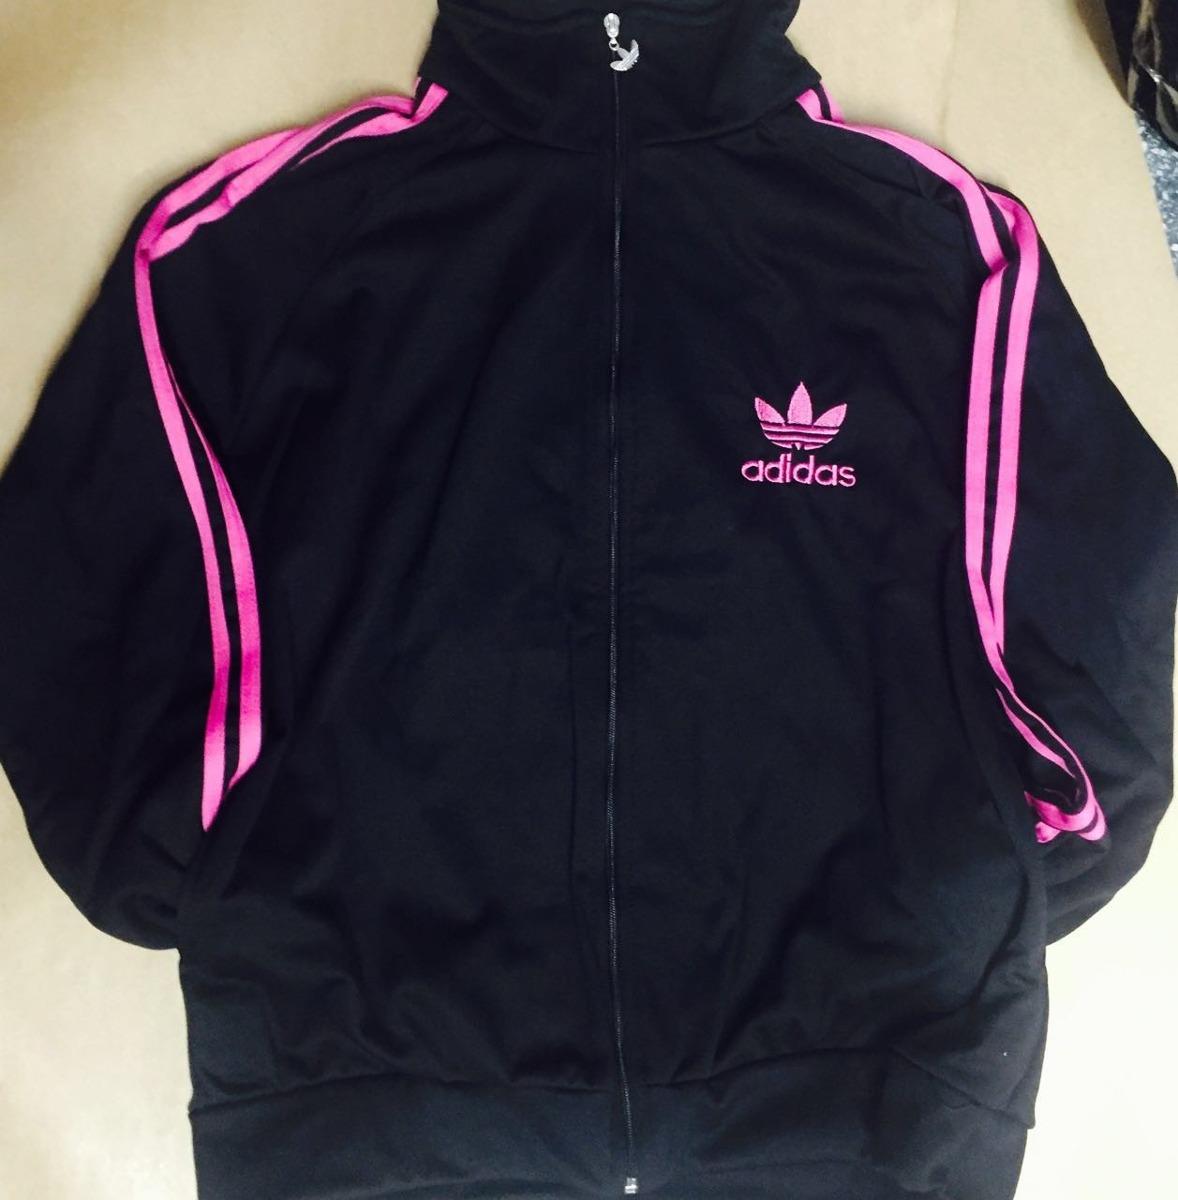 b3c18d91bb7 casaco adidas preto e rosa